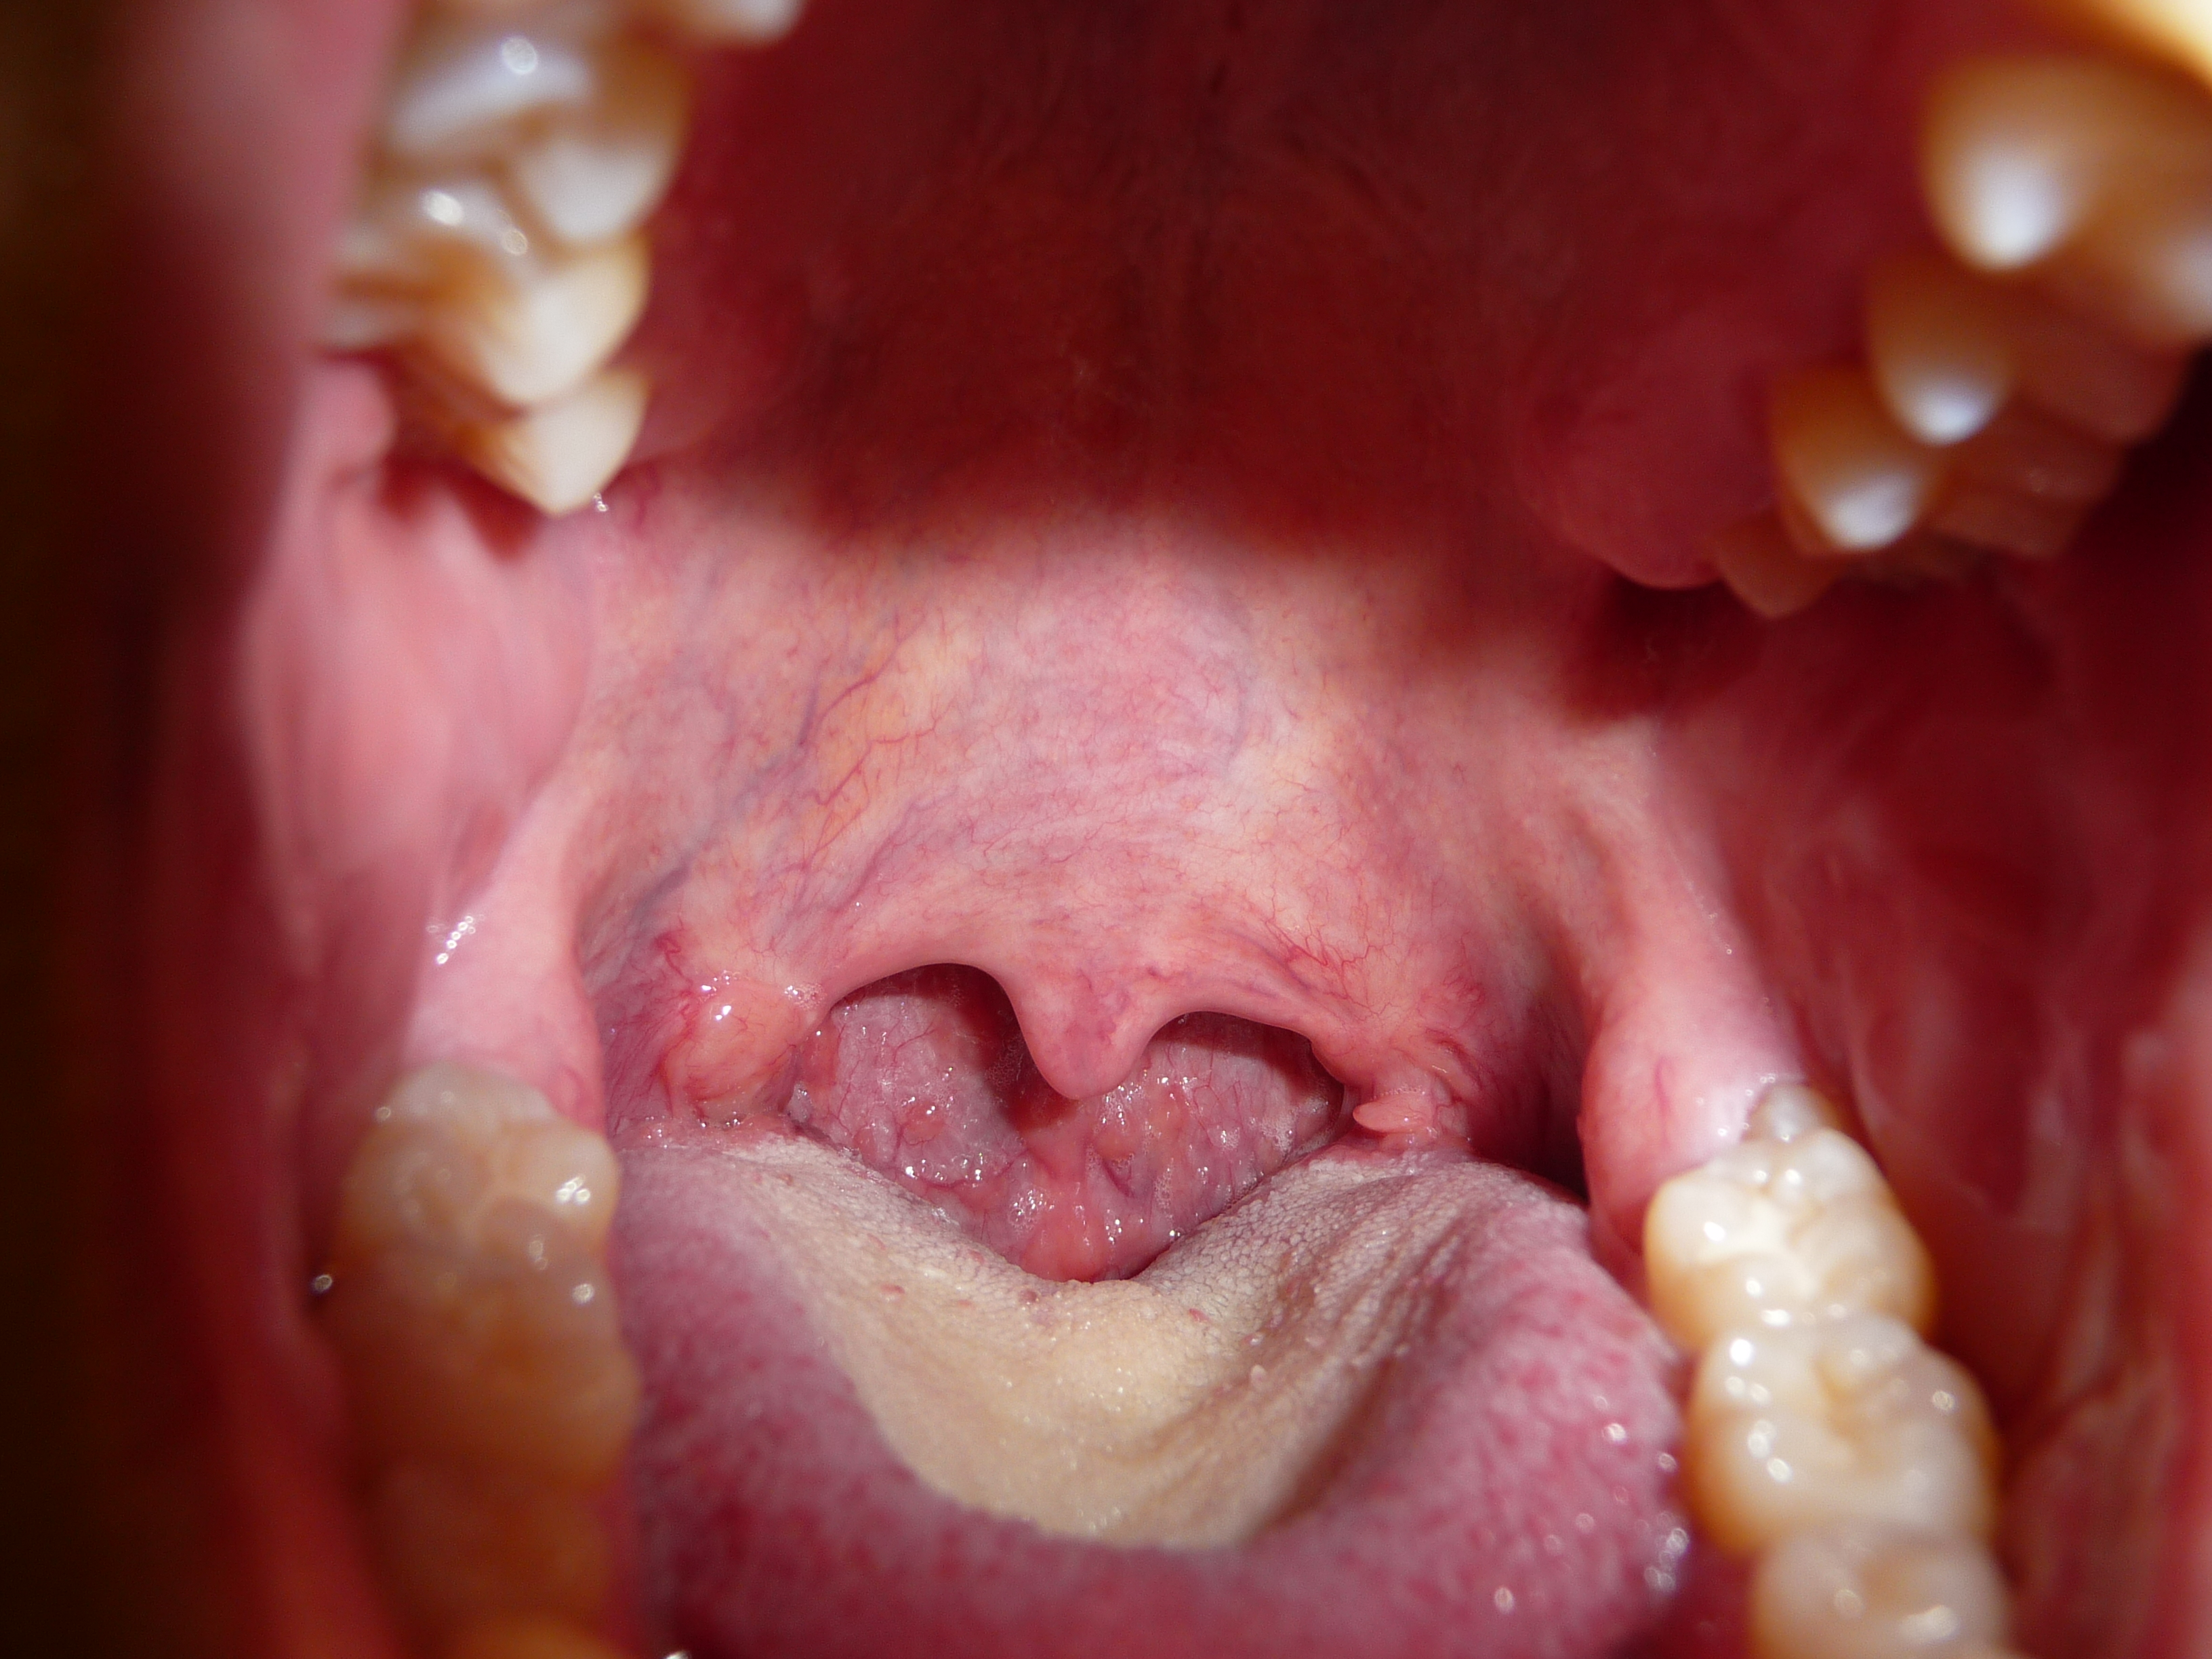 Pin Hpv-throat on Pinterest